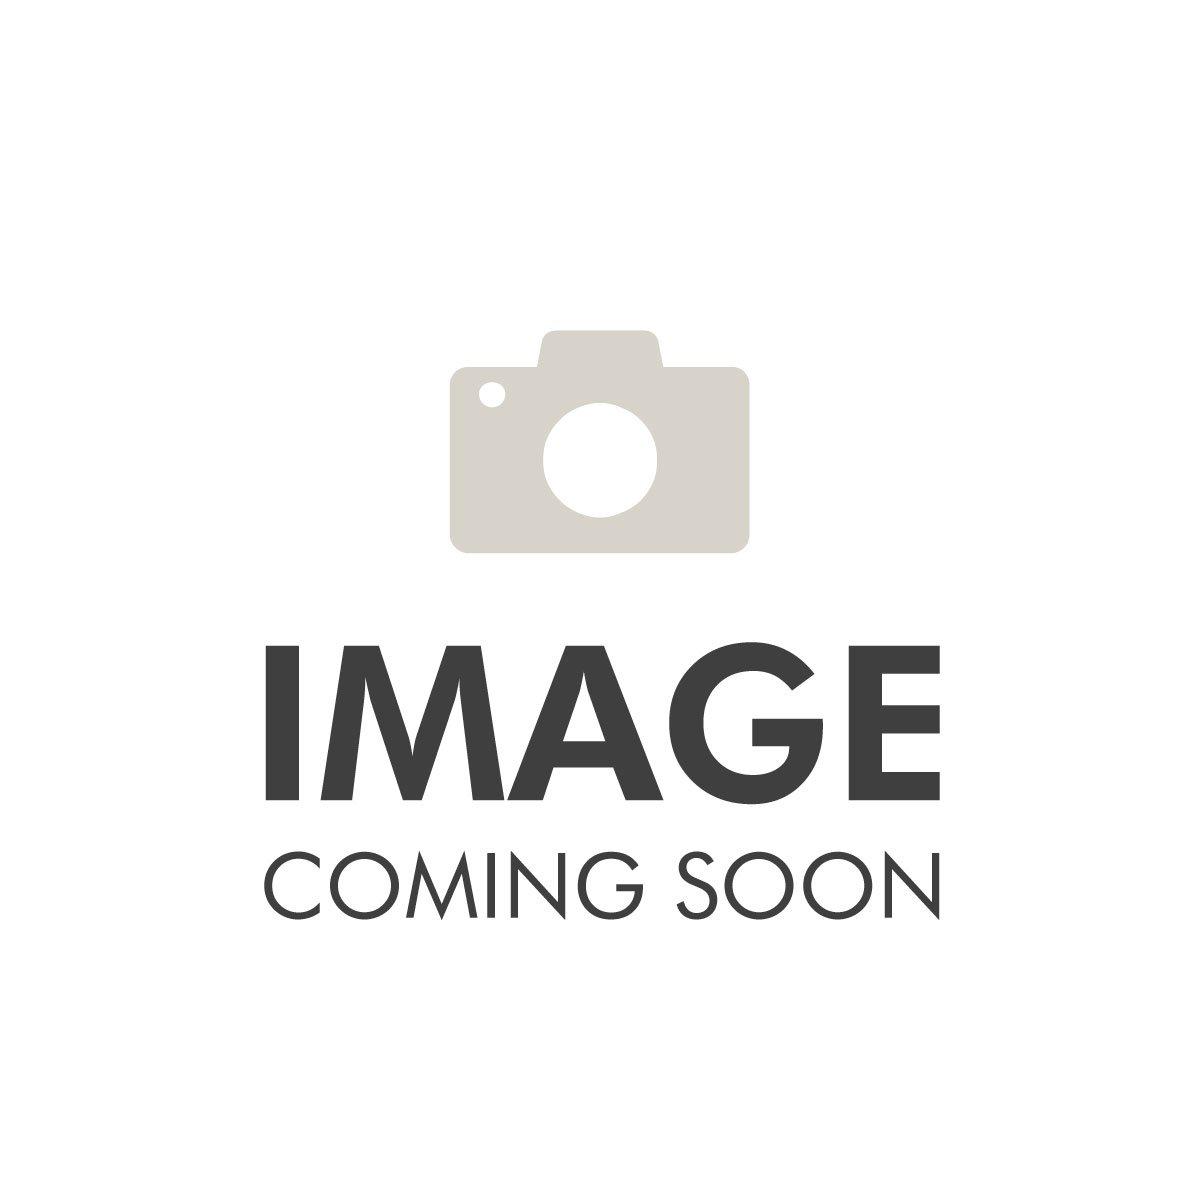 Justin Bieber Girlfriend 30ml EDP Spray